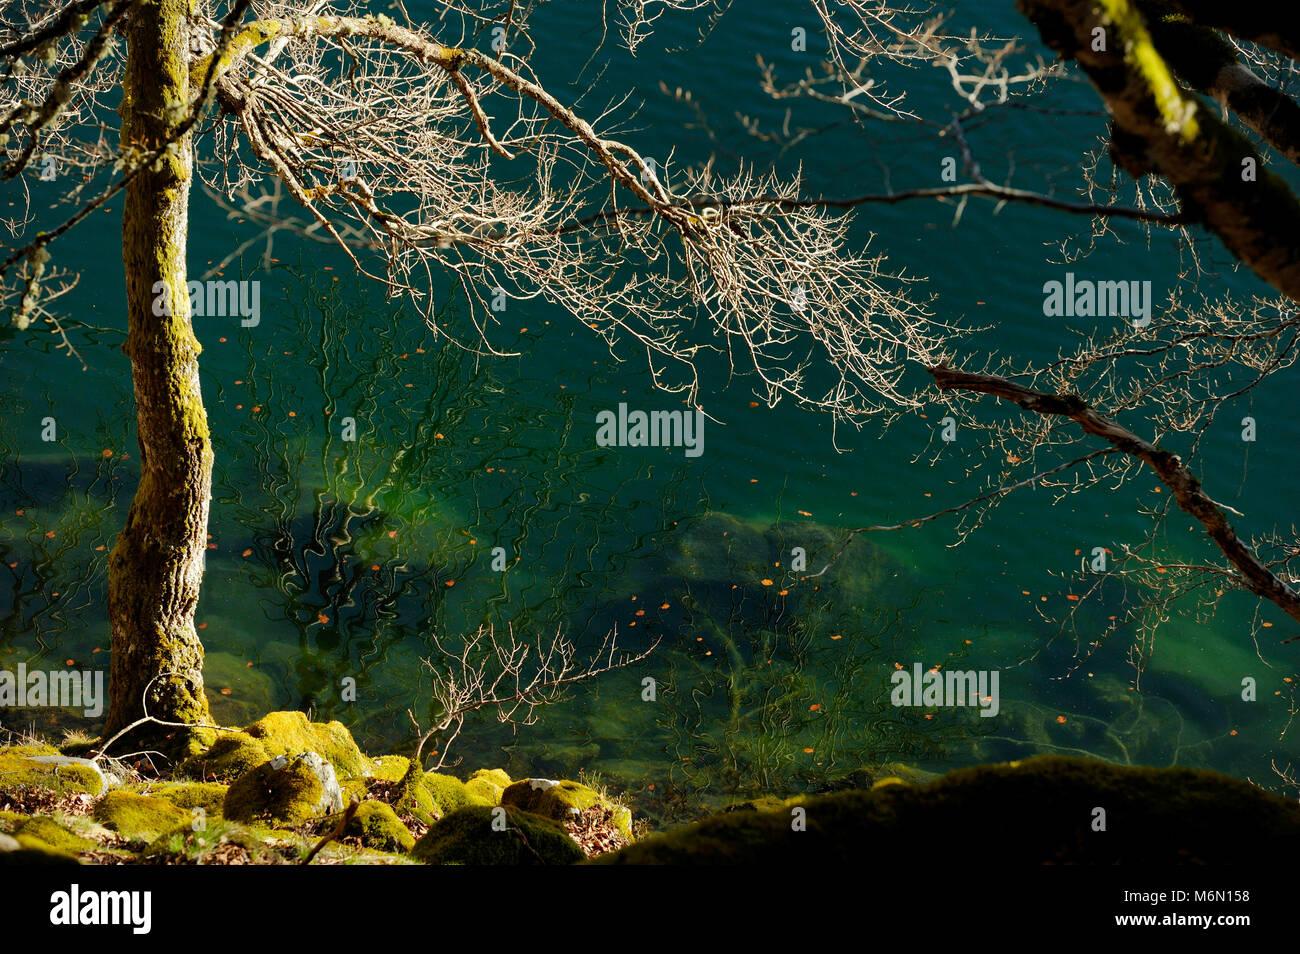 Paimpont Forest or Broceliande Forest: the Fairy Mirror (ÒMiroir aux FeesÓ) - Stock Image